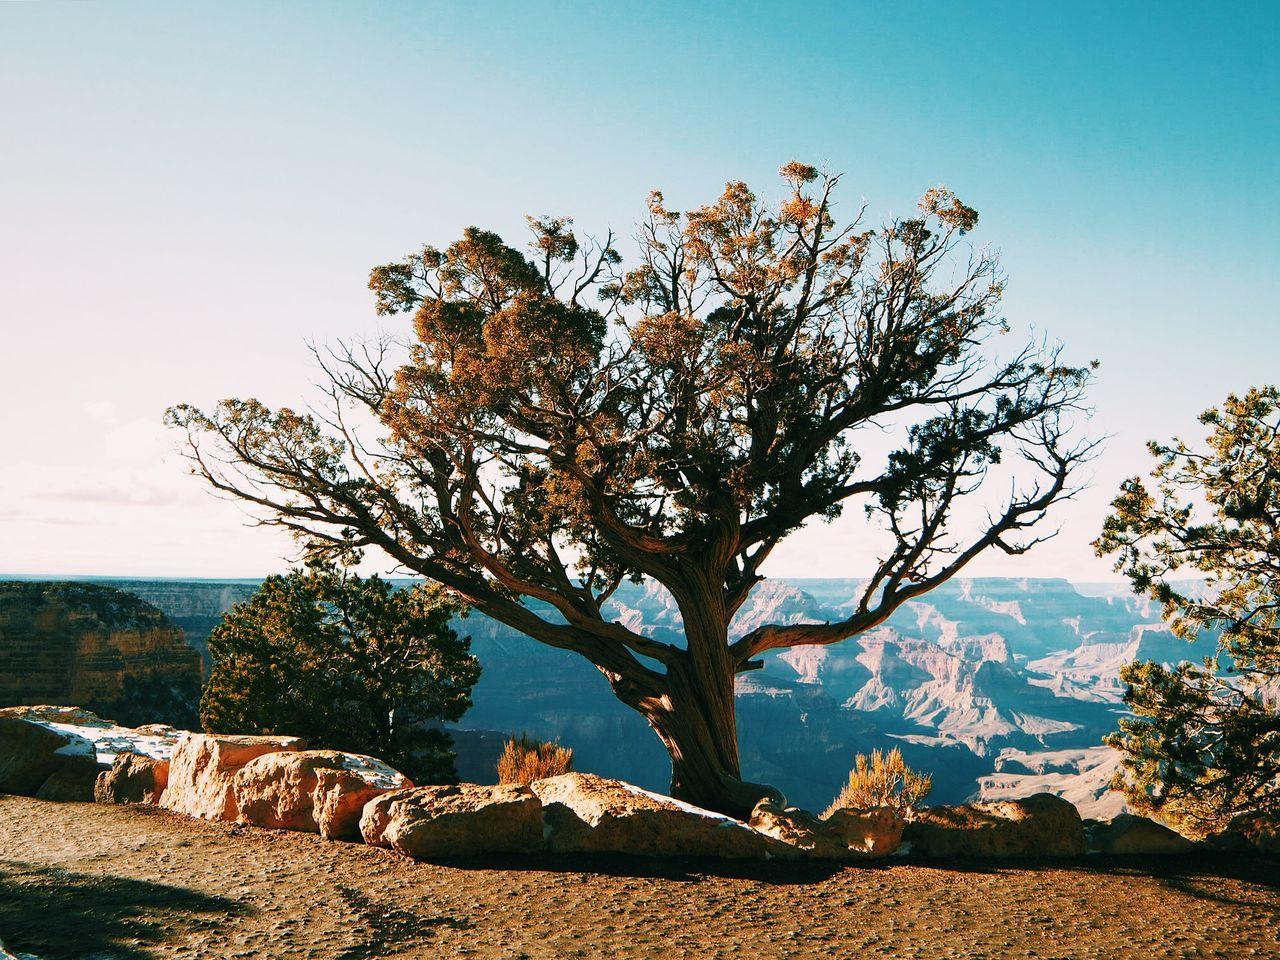 EyeEm Nature Lover Beauty Nature Enjoying Life Arizona Grandcanyon Trees TreePorn Enjoying The View The Great Outdoors - 2015 EyeEm Awards